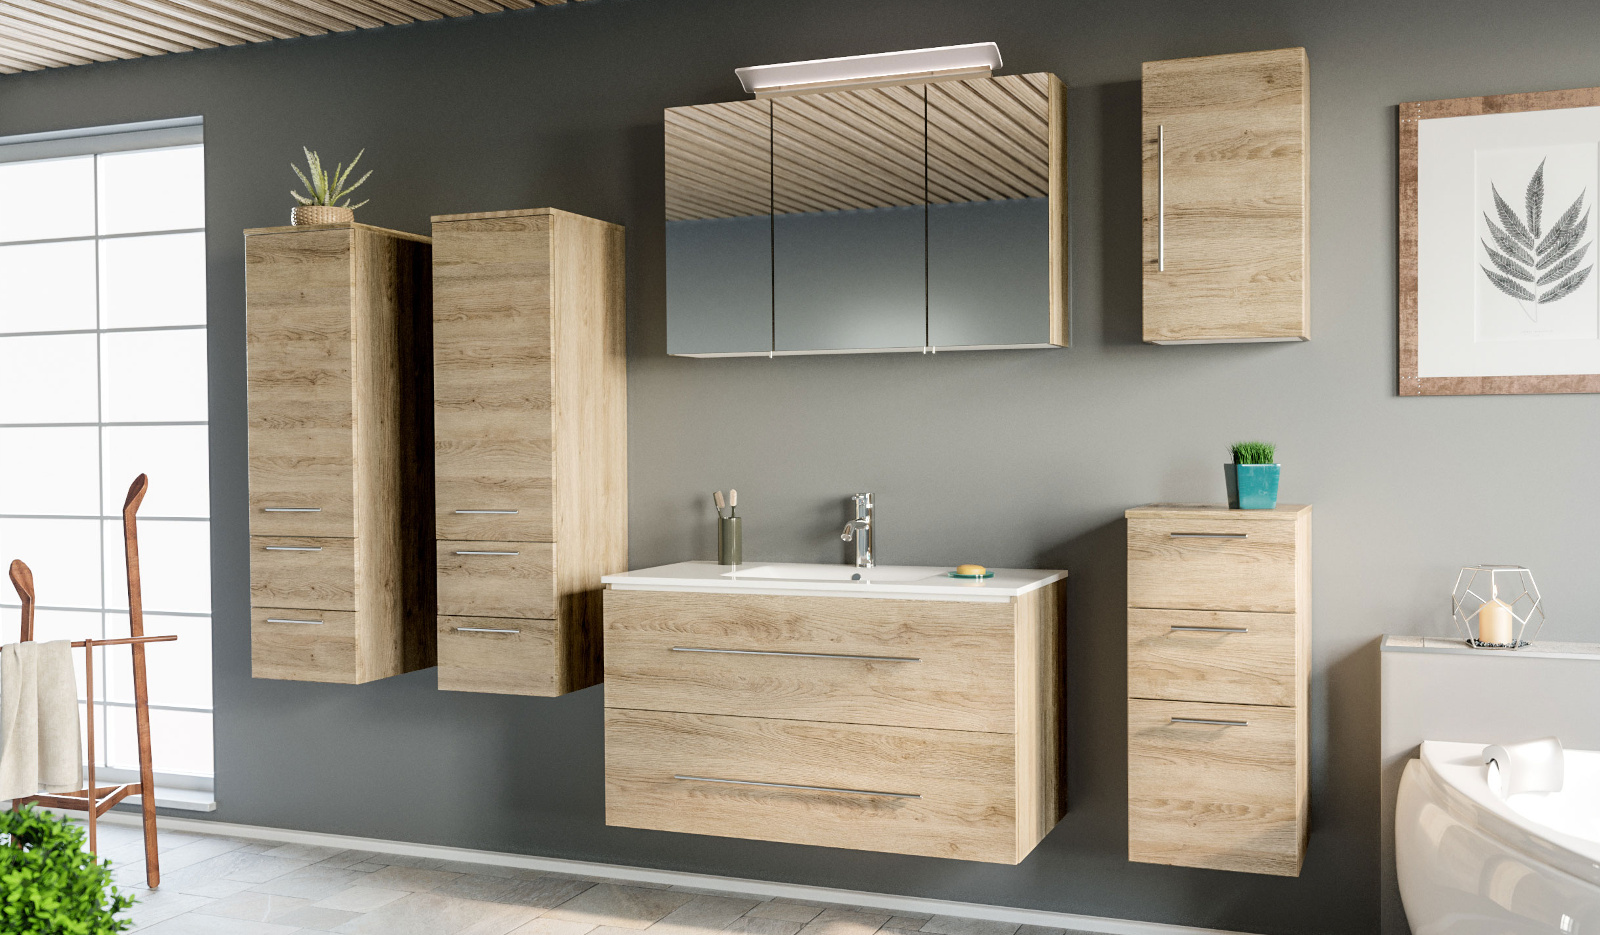 kleiderschrank massivholz kiefer massiv antik gewachst. Black Bedroom Furniture Sets. Home Design Ideas